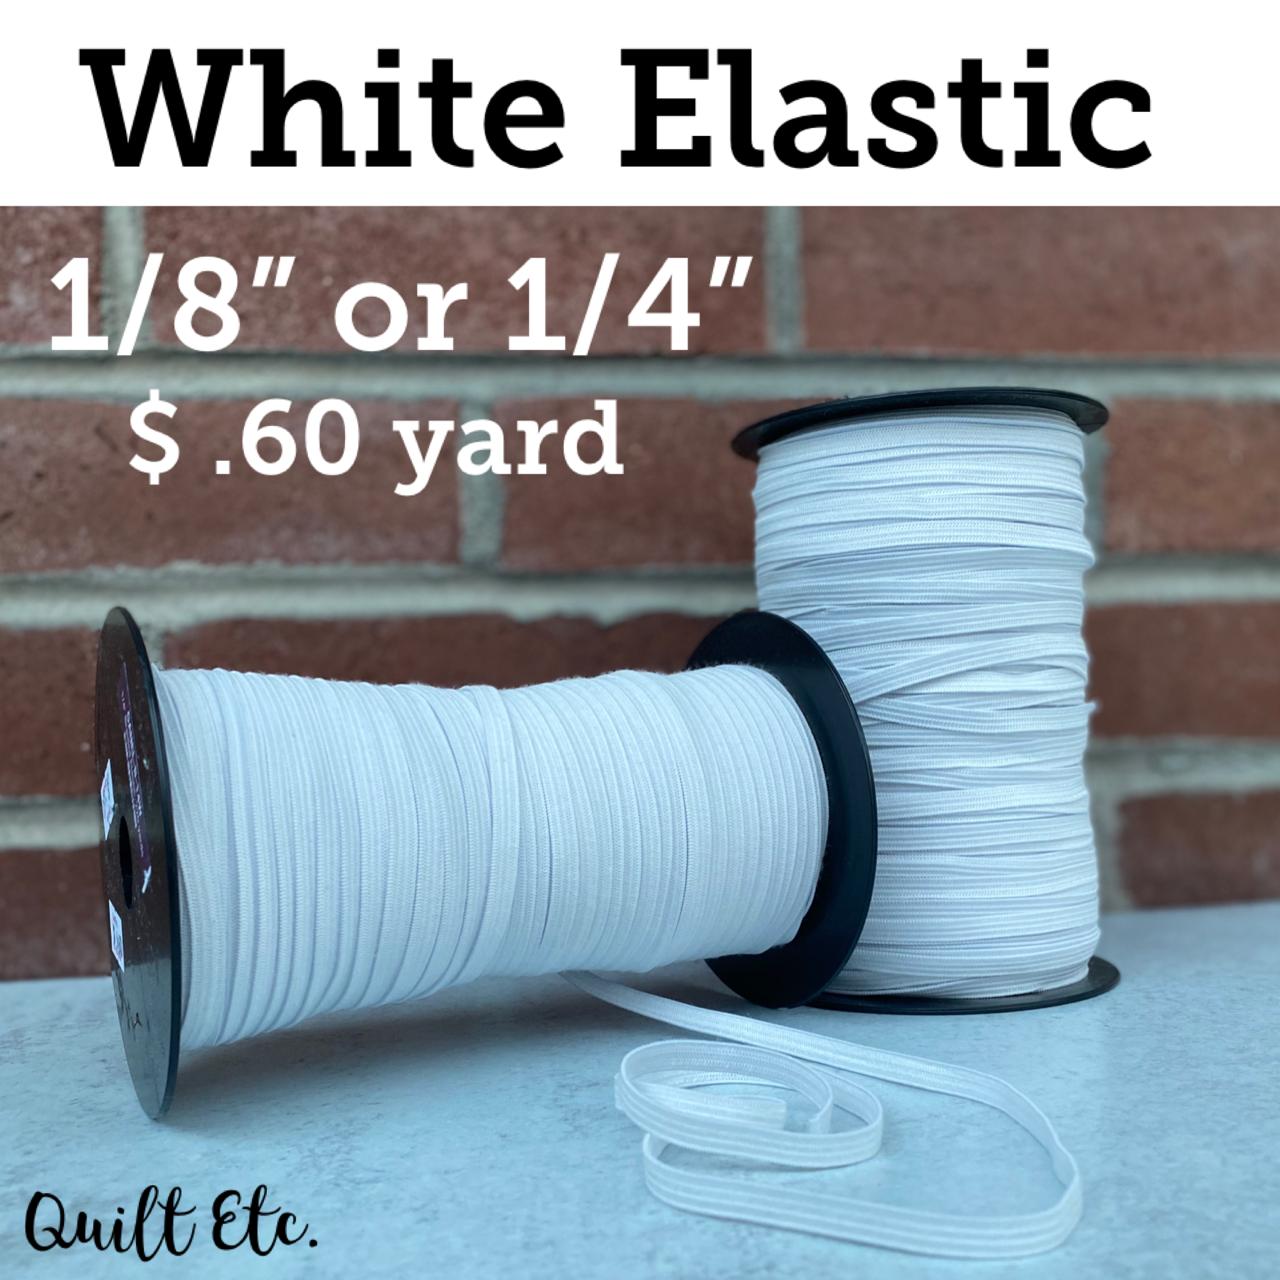 White Elastic 1/8 & 1/4